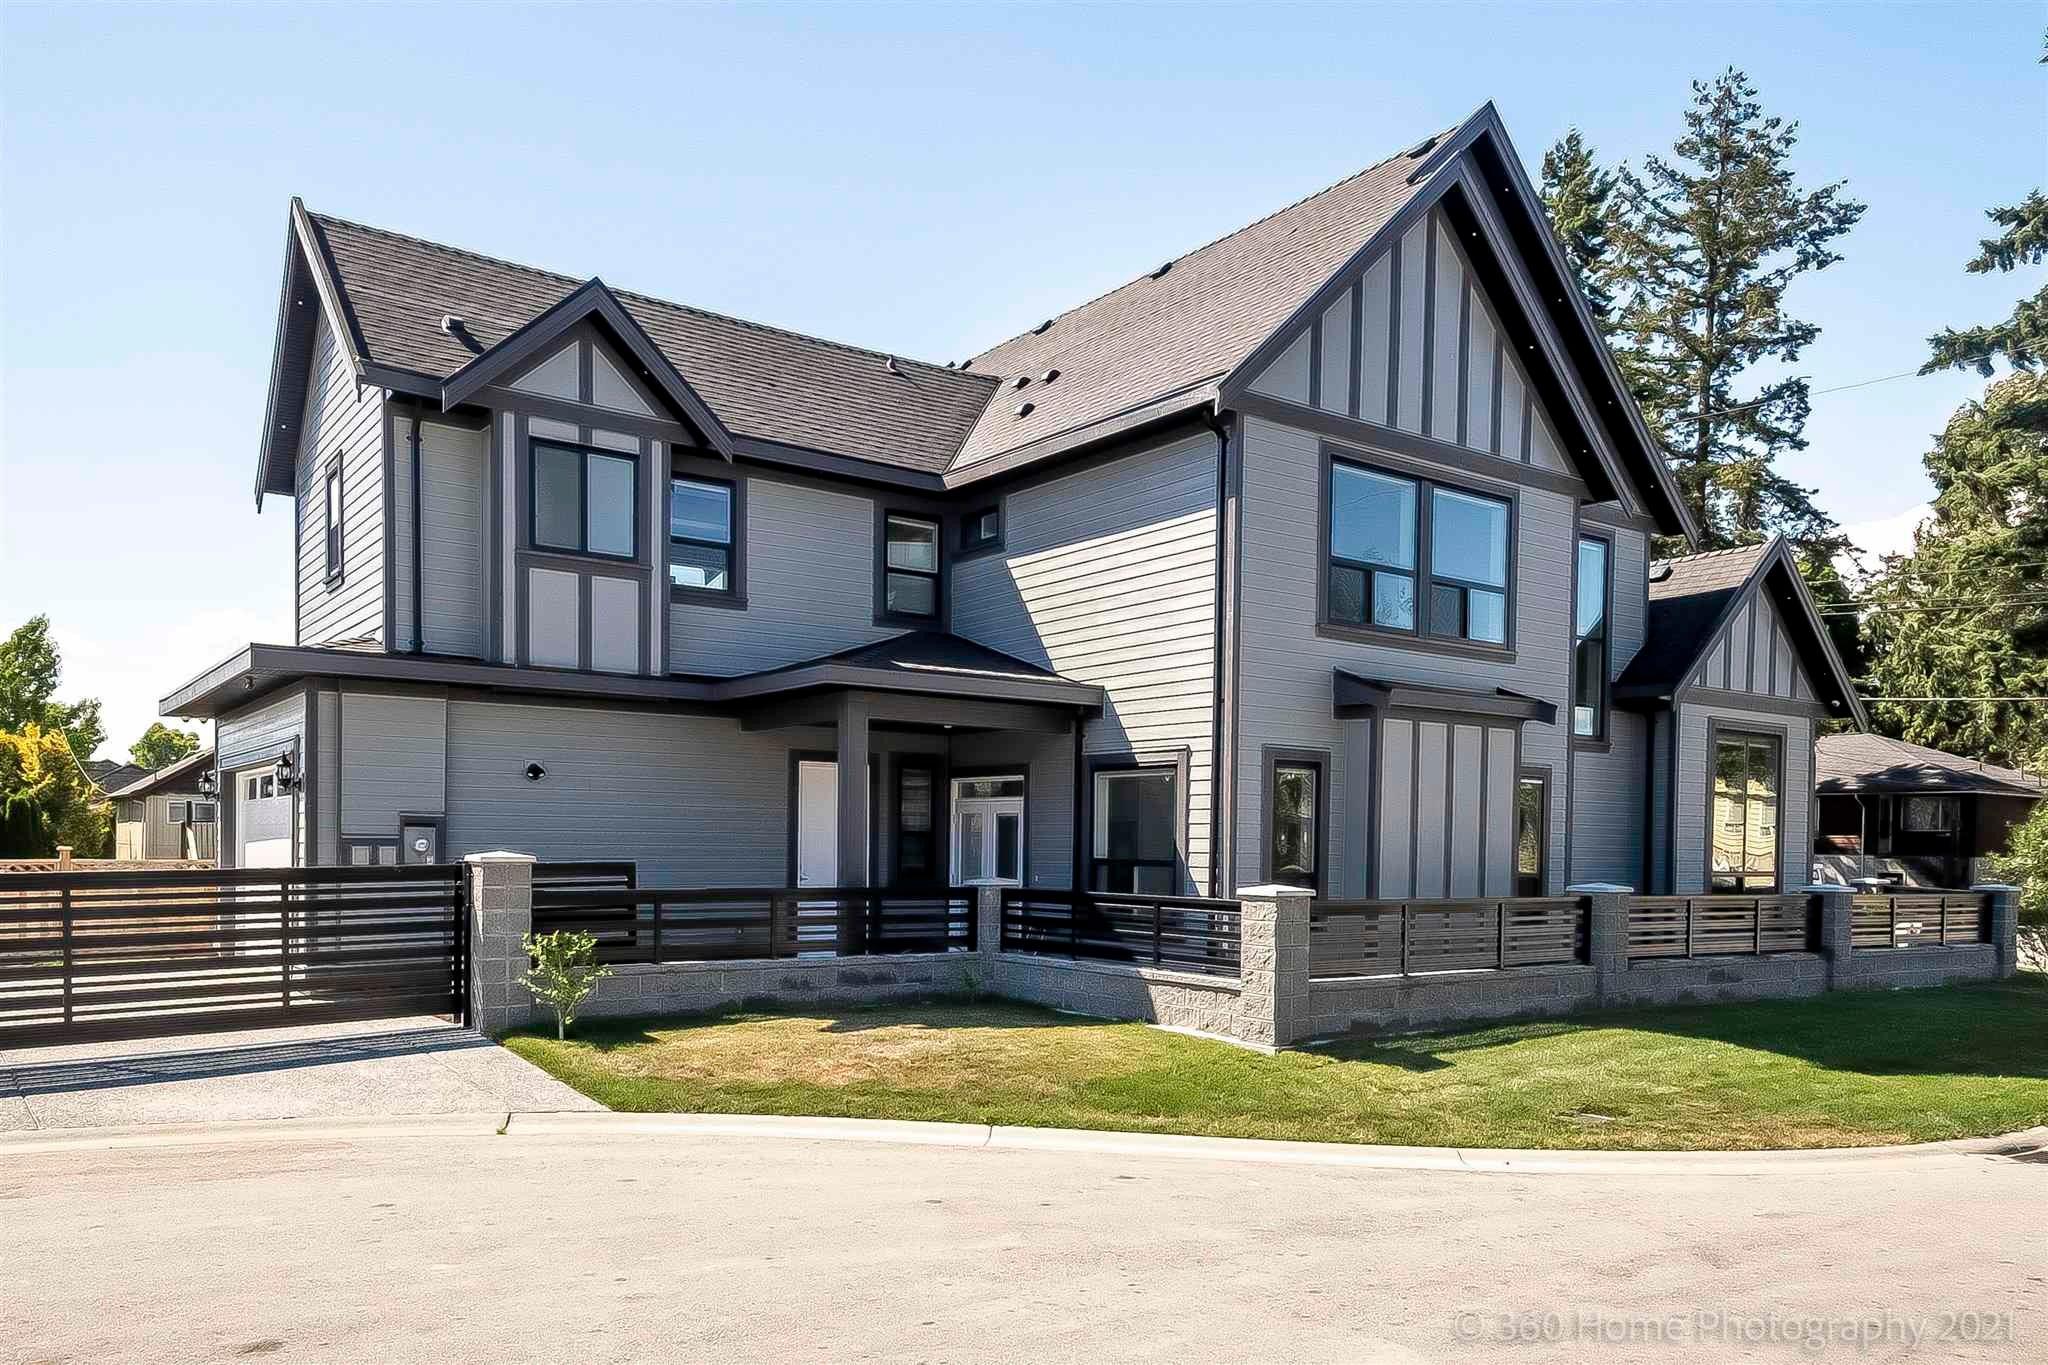 13050 101B AVENUE - Cedar Hills House/Single Family for sale, 5 Bedrooms (R2602208) - #3